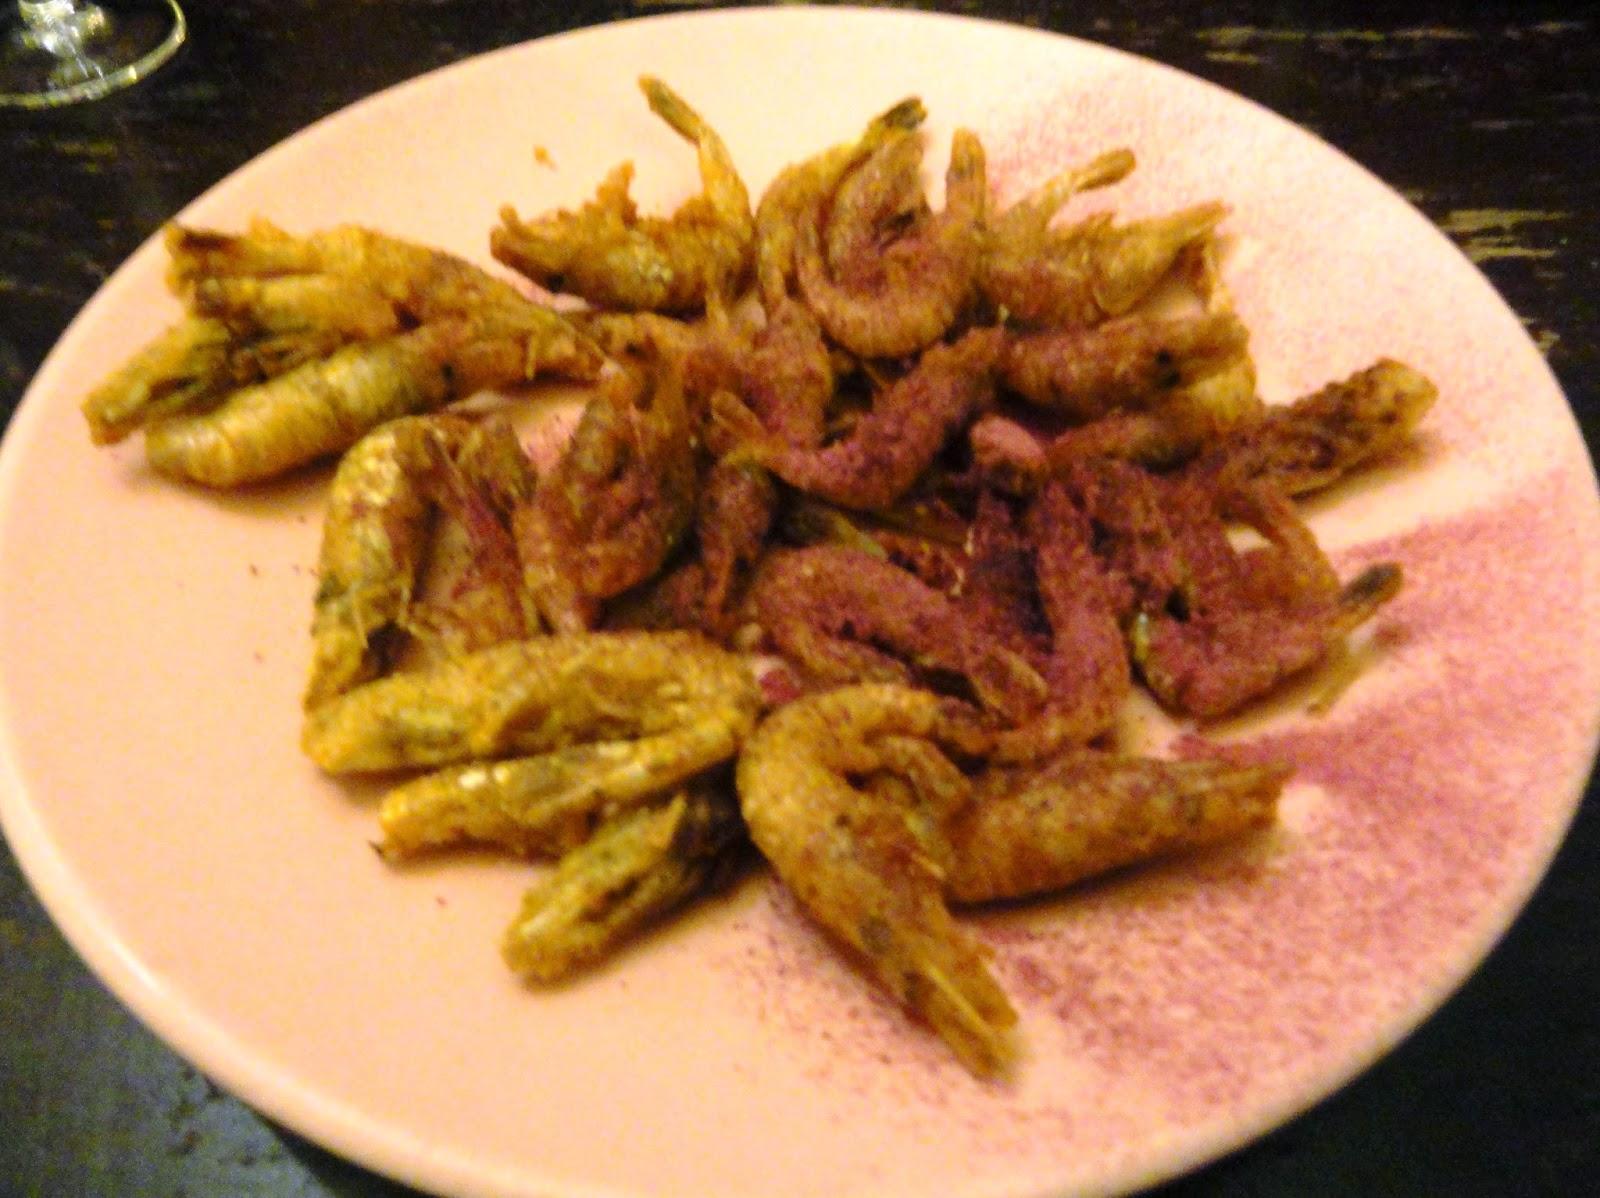 Blu aubergine restaurant review le chateaubriand paris for Freds fish fry menu